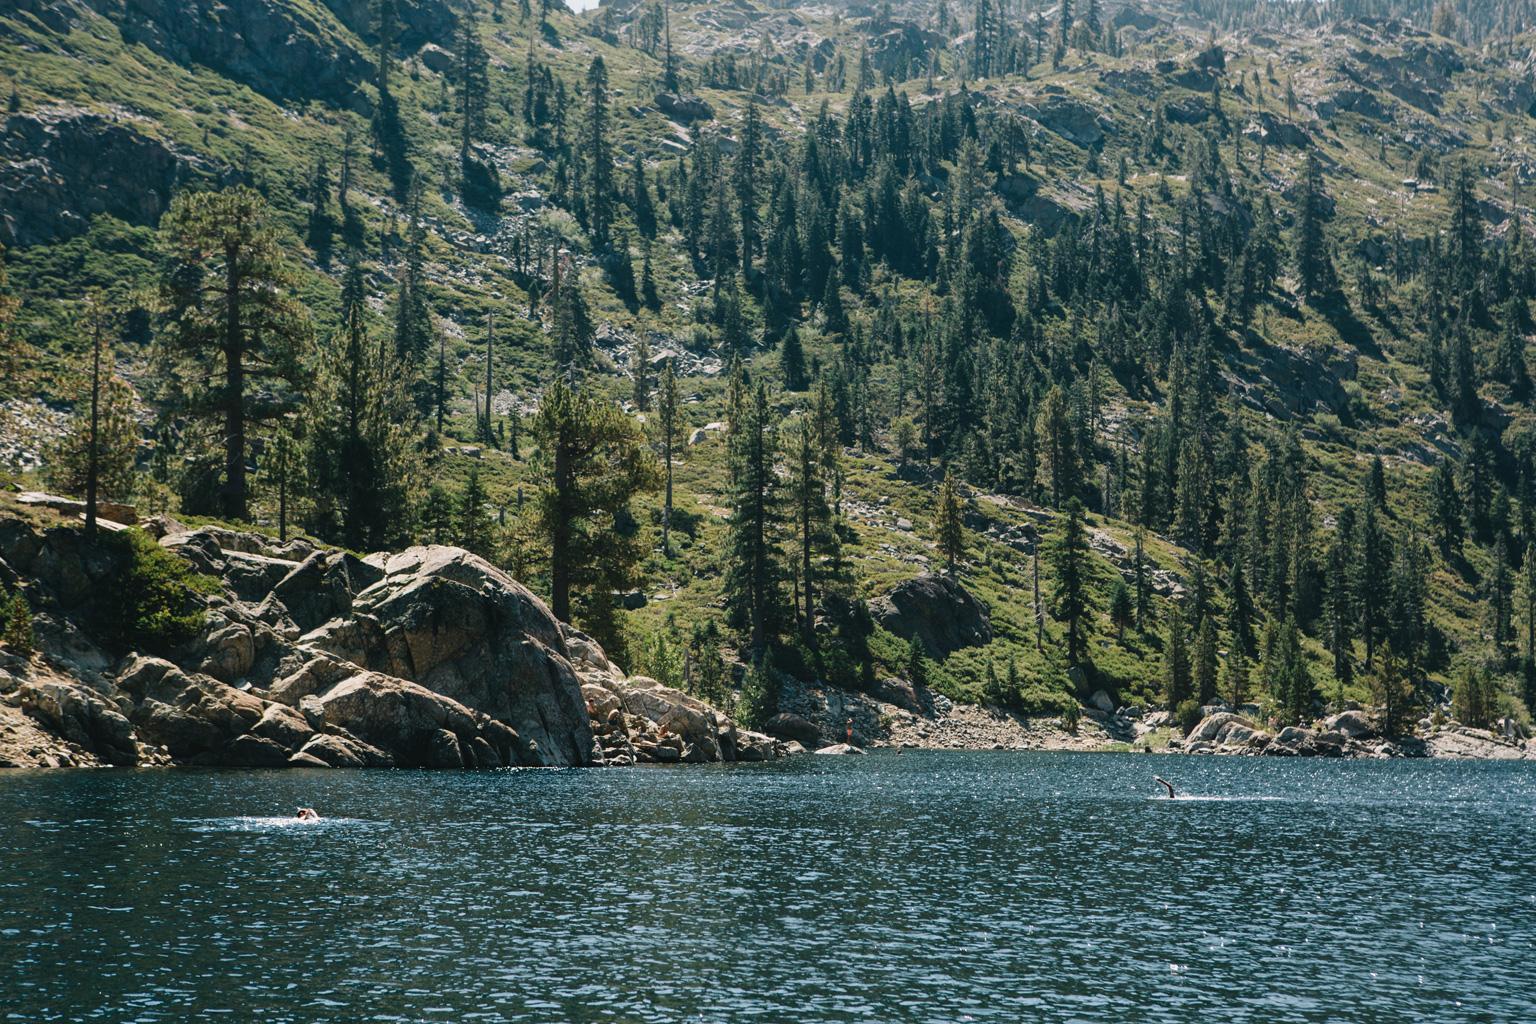 CindyGiovagnoli_outdoors_photographer_Sierra_Buttes_firetower_watchtower_Sardine_Snag_Bear_lake_hike_swim_camp-051.jpg